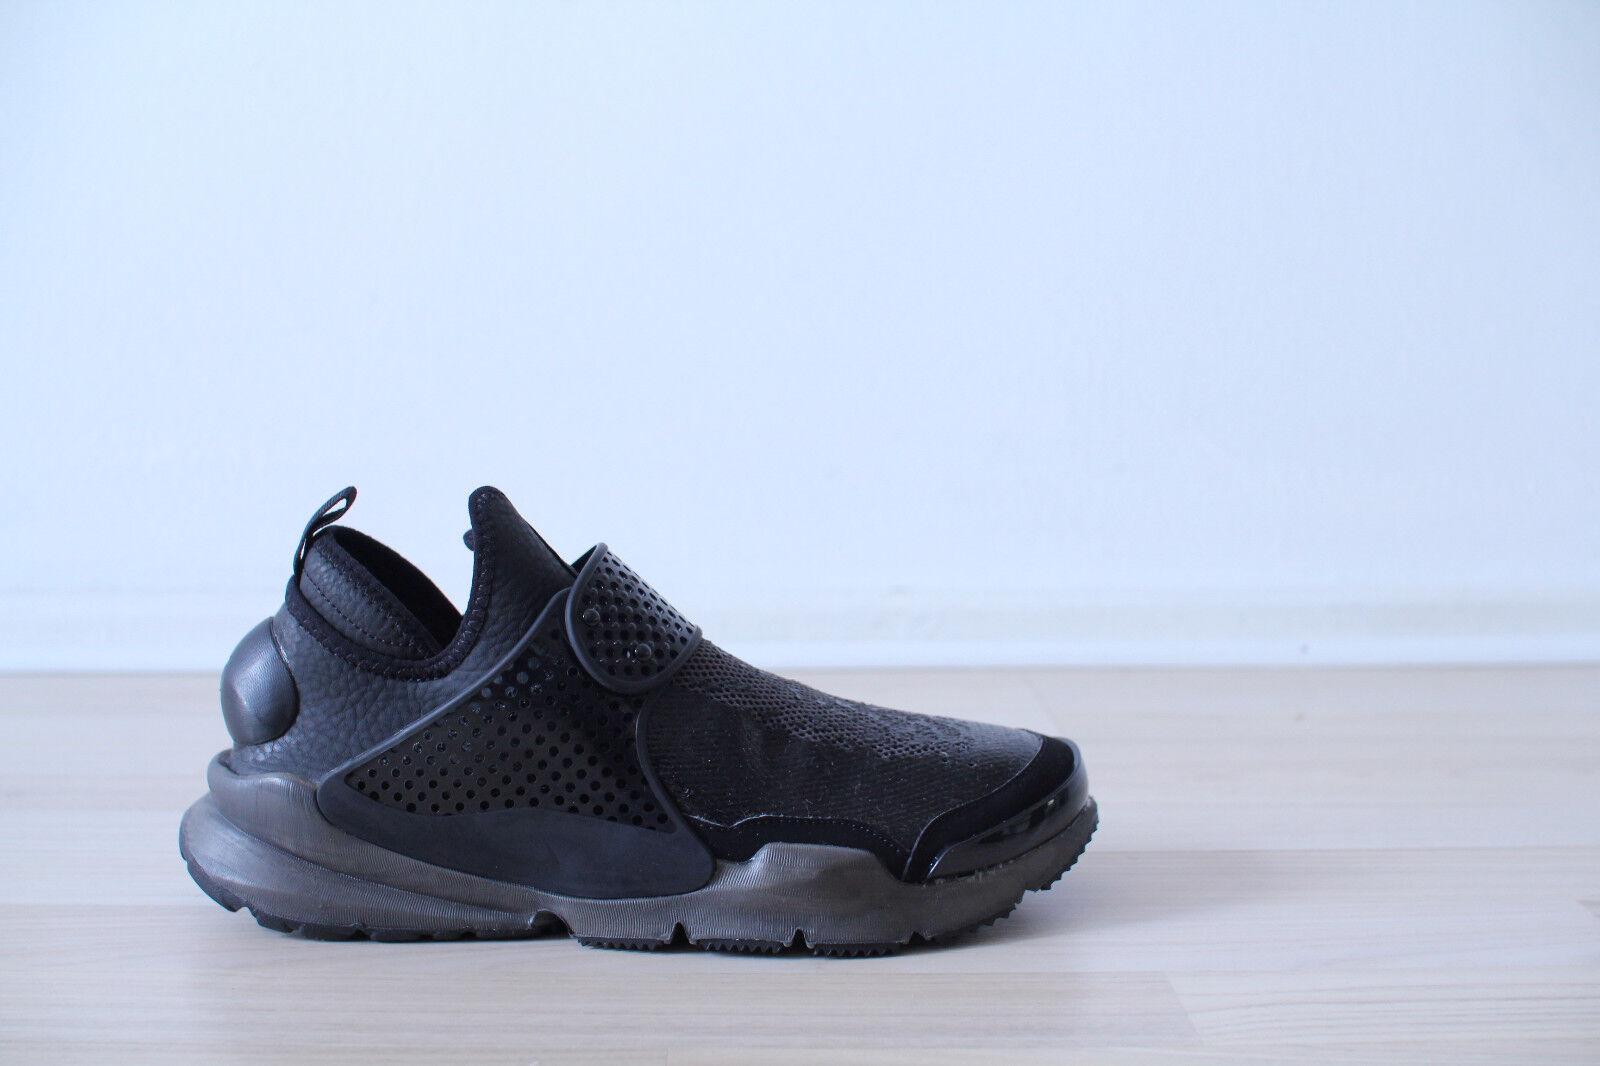 Nike X Stone Island Sock Dart Dart Dart Mid Schwarz Gr. 41,42,43,44 NEU & OVP a776ee